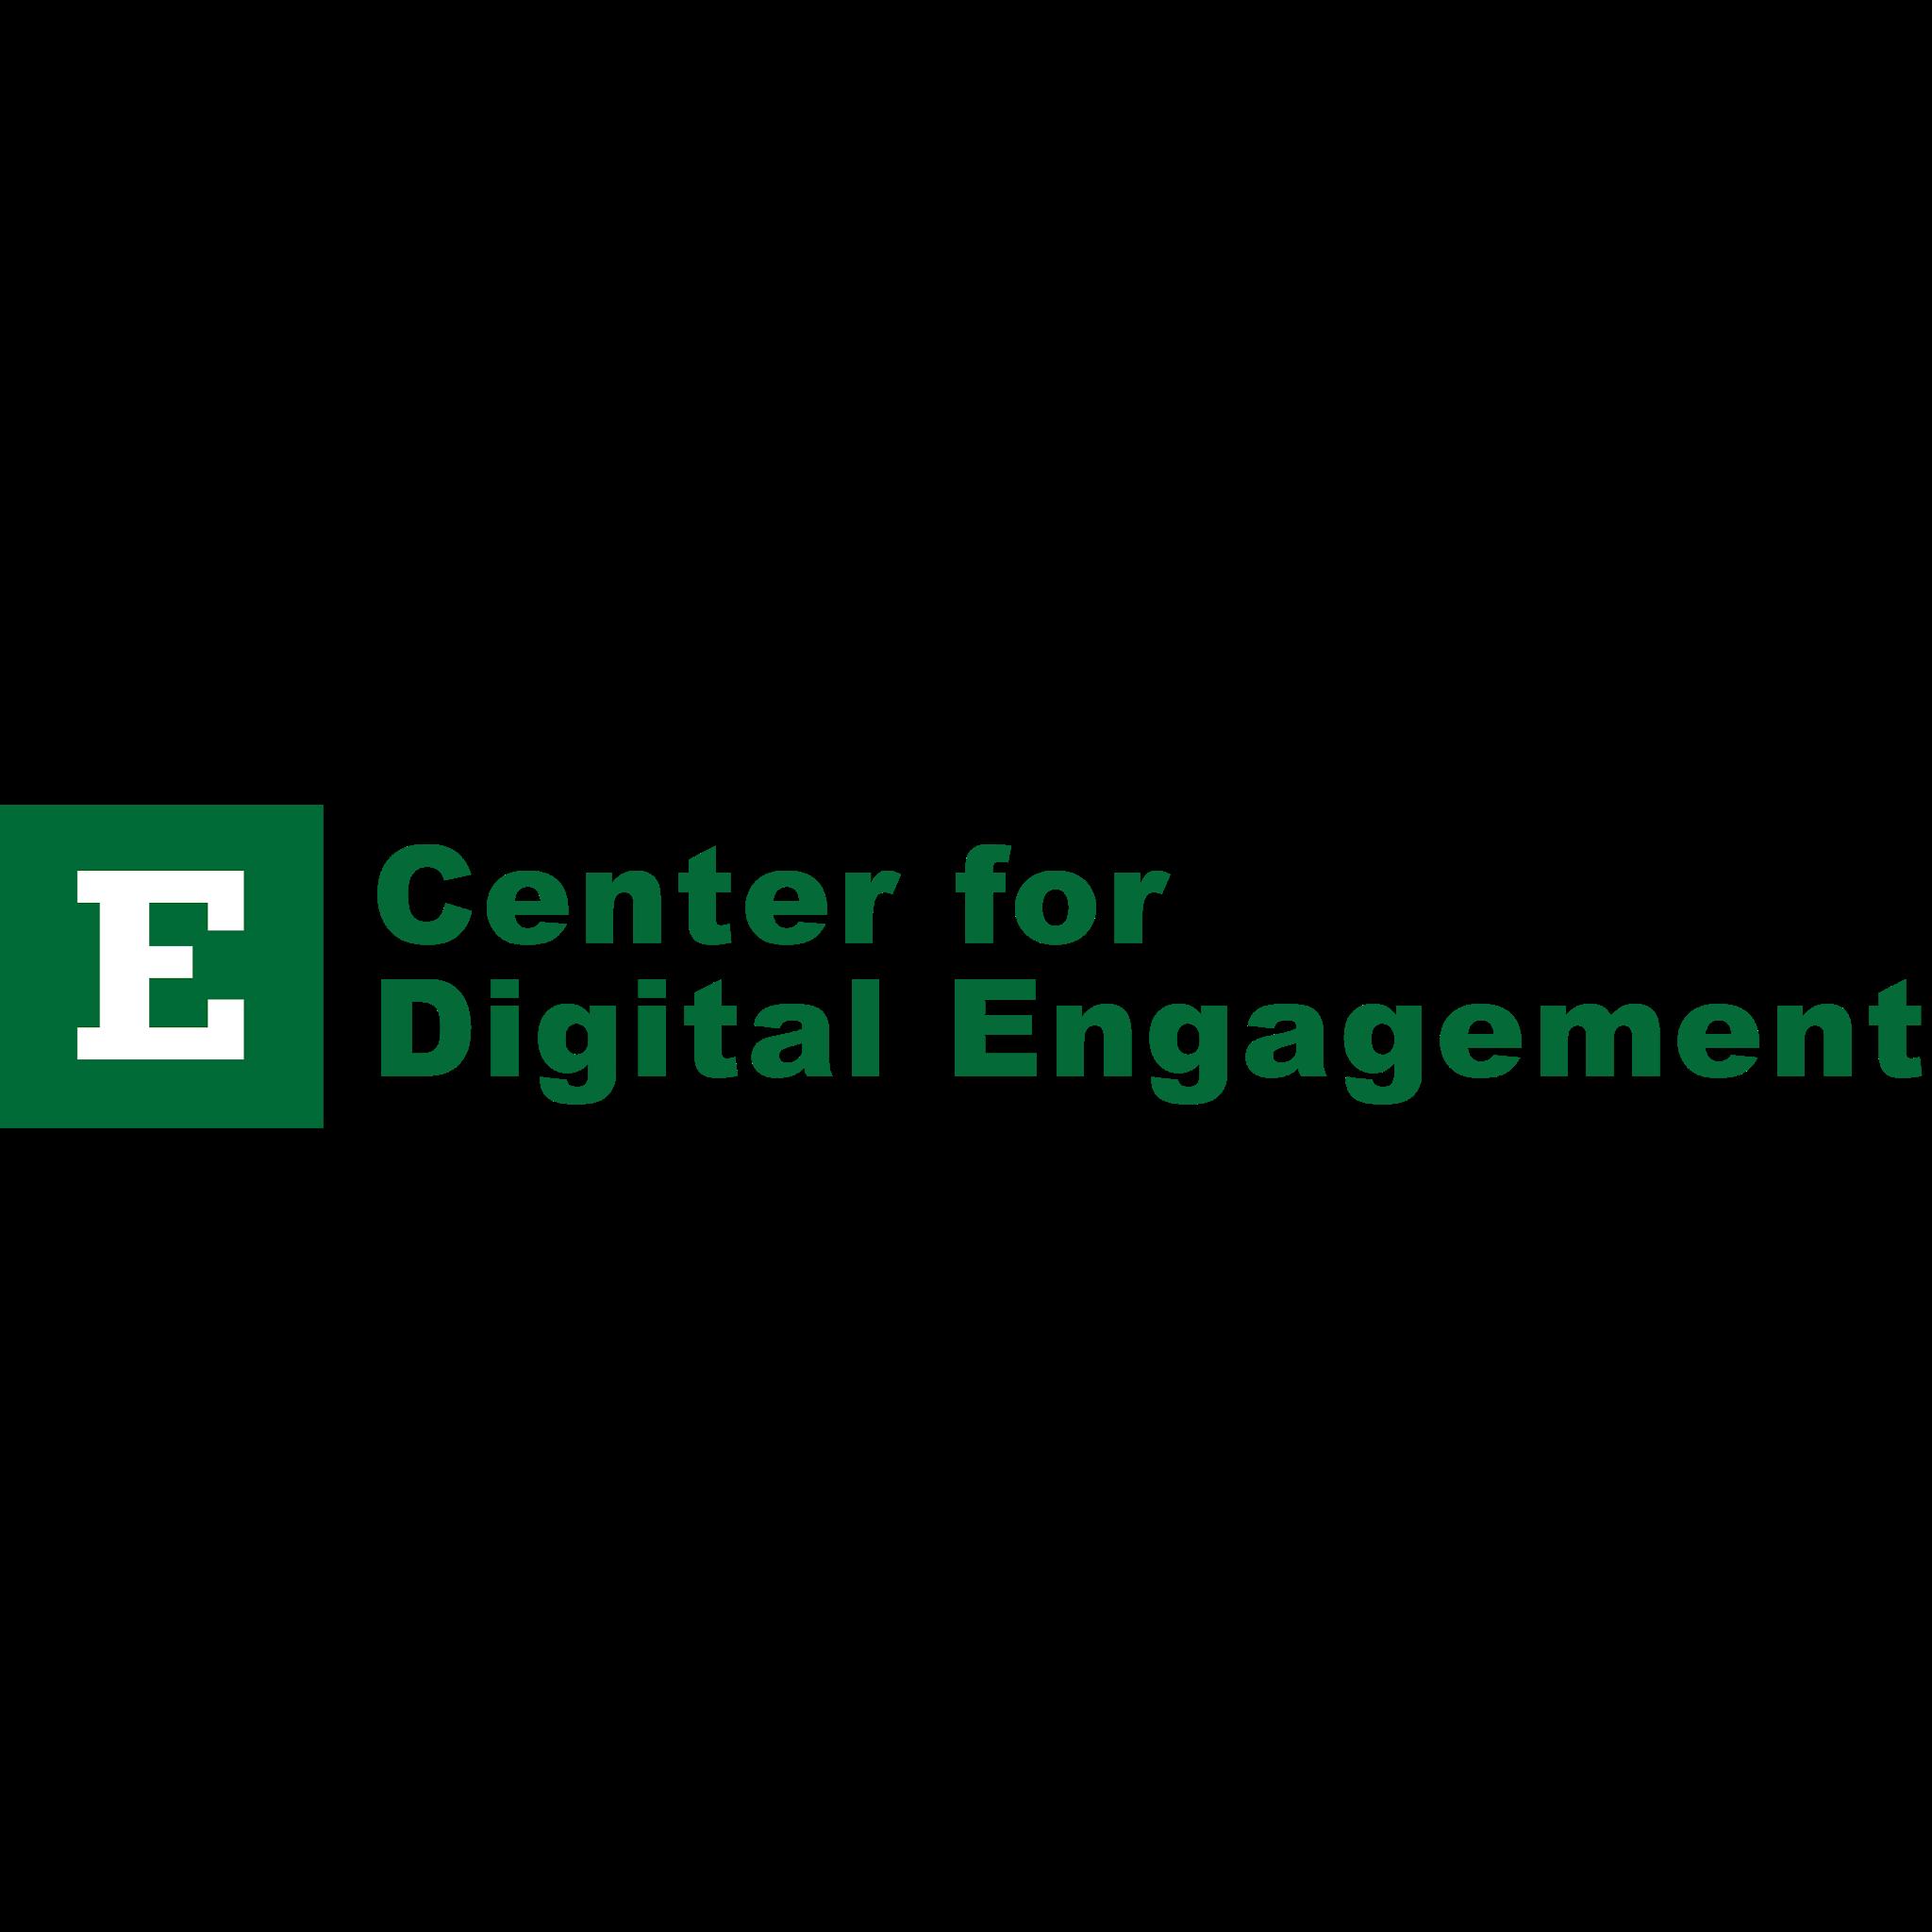 EMU Center for Digital Engagement